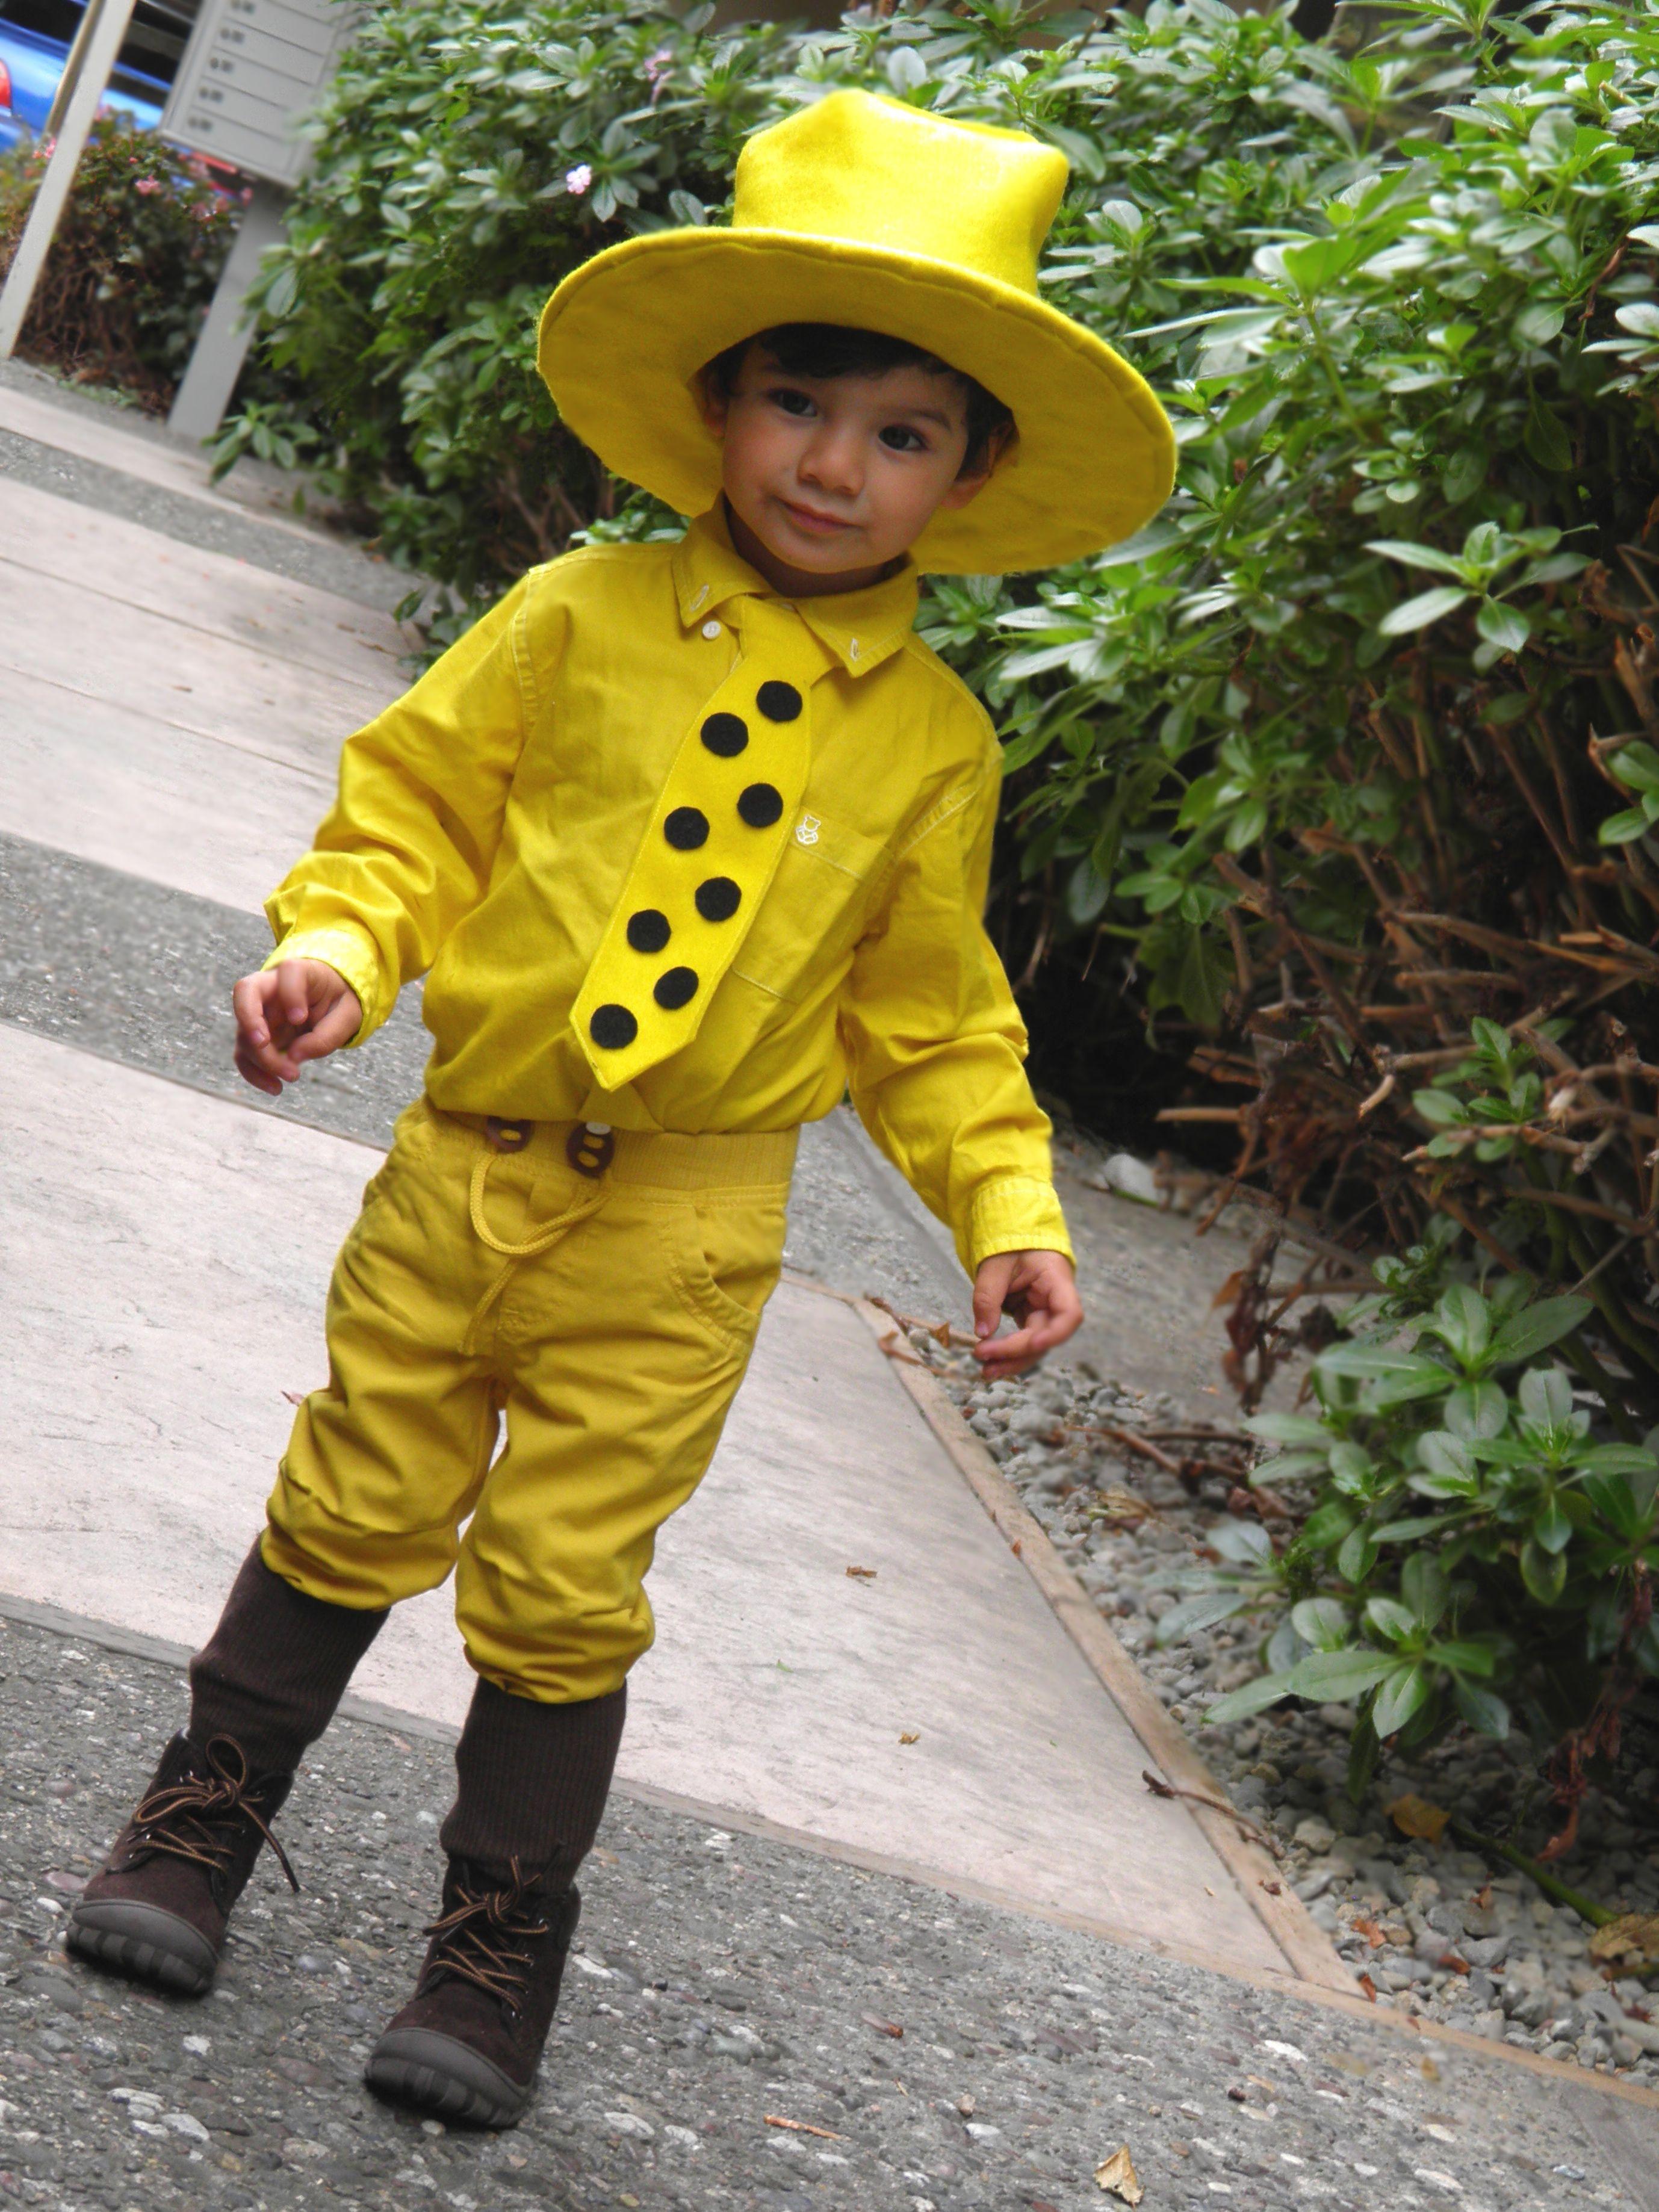 Diy halloween costume man in the yellow hat from curious george diy halloween costume man in the yellow hat from curious george solutioingenieria Gallery